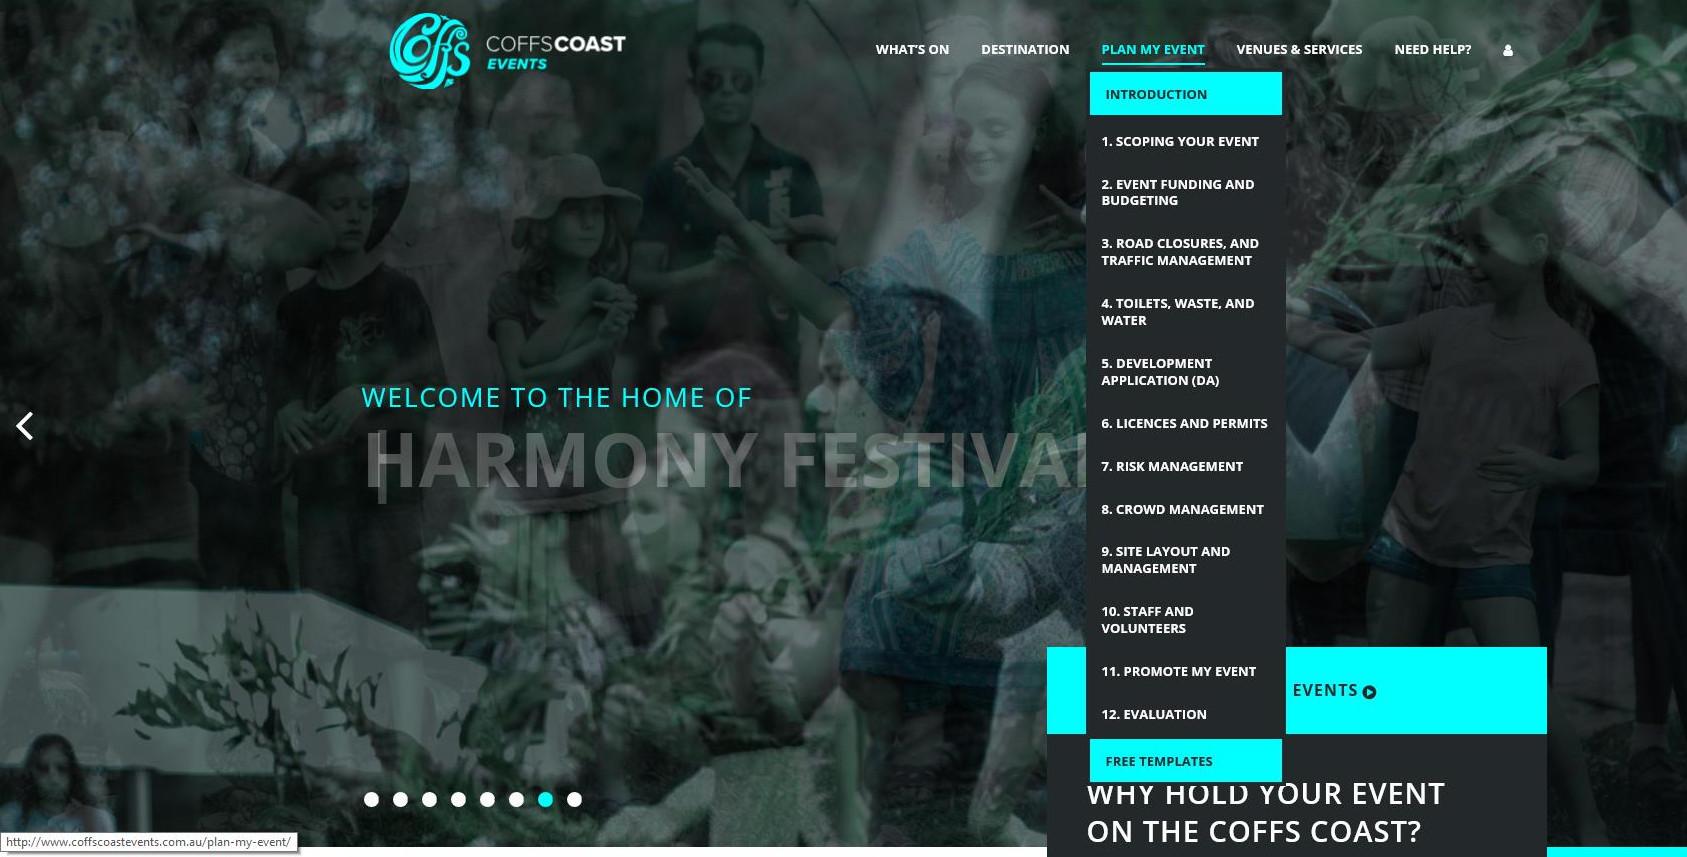 Coffs Coast Events website screenshot